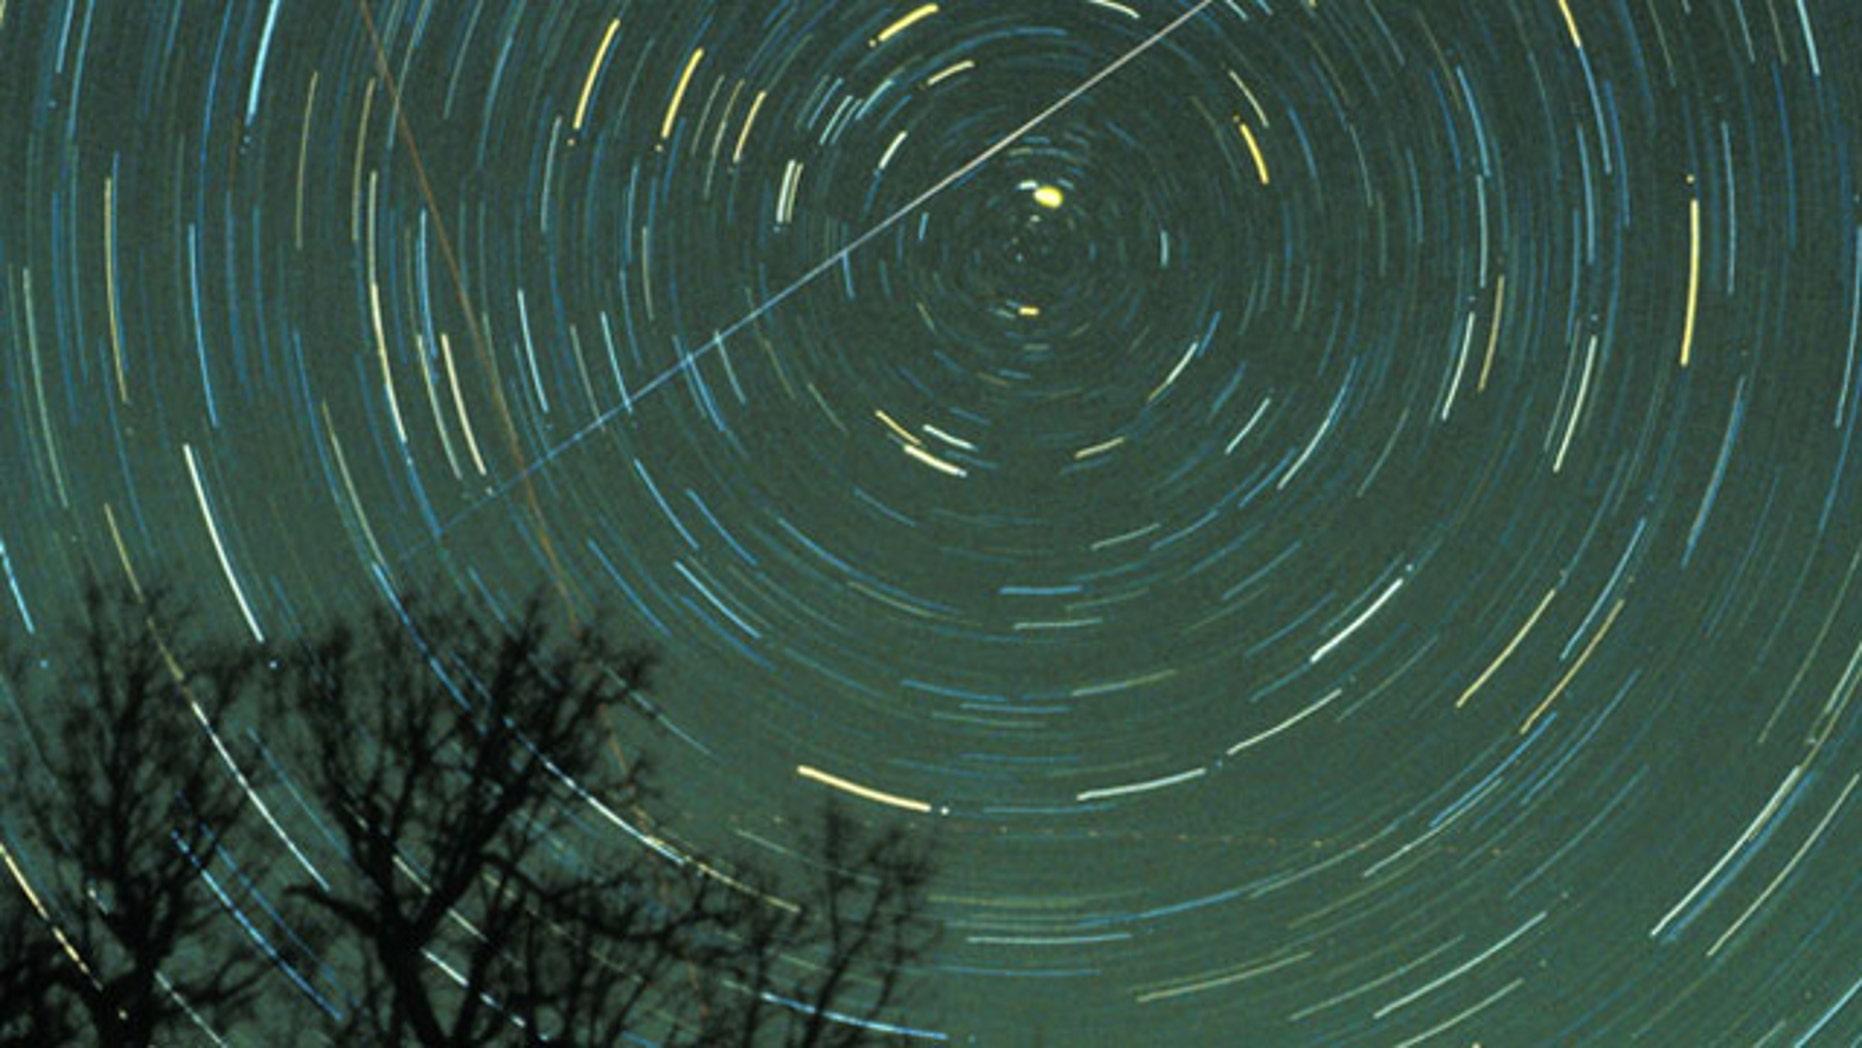 A Geminid meteor streaks across the sky.